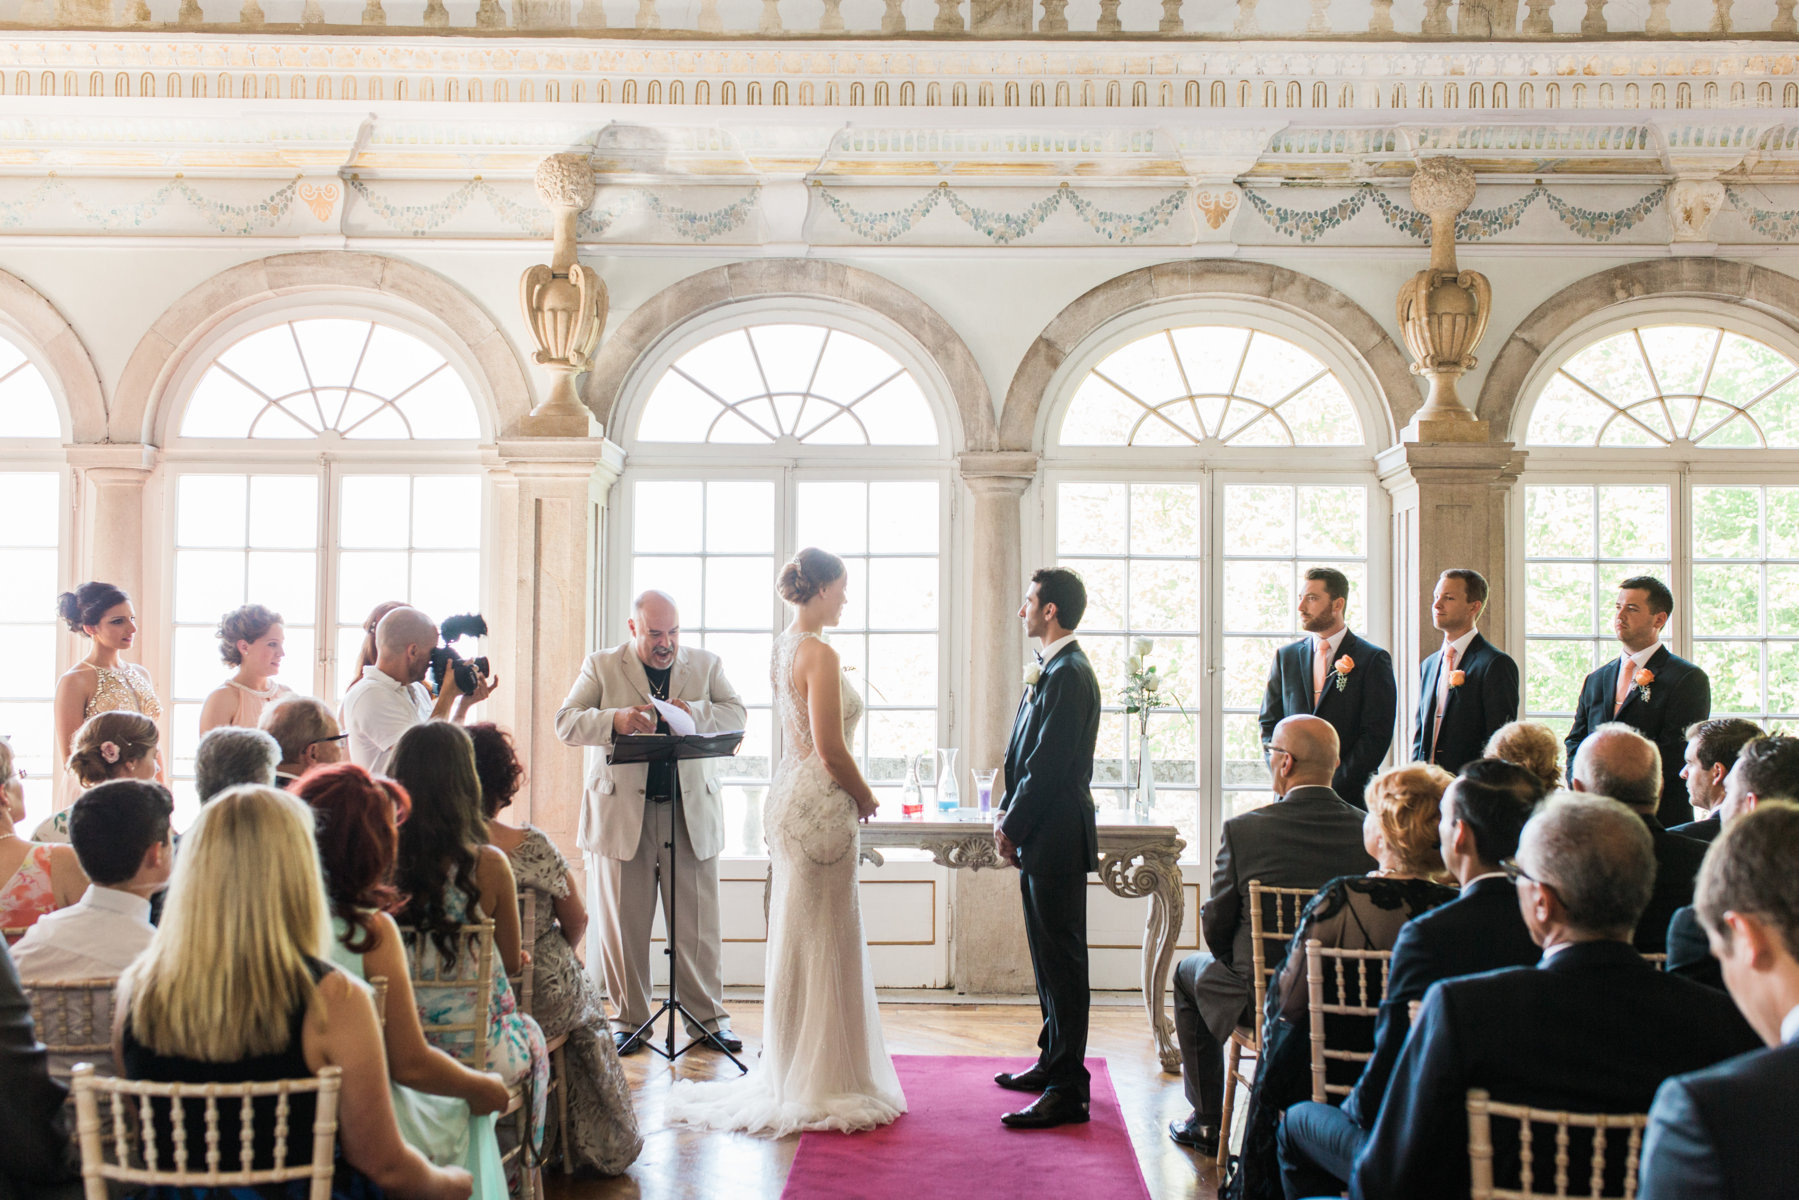 mariarao-wedding-casadospenedos-sintra-166 web.jpg